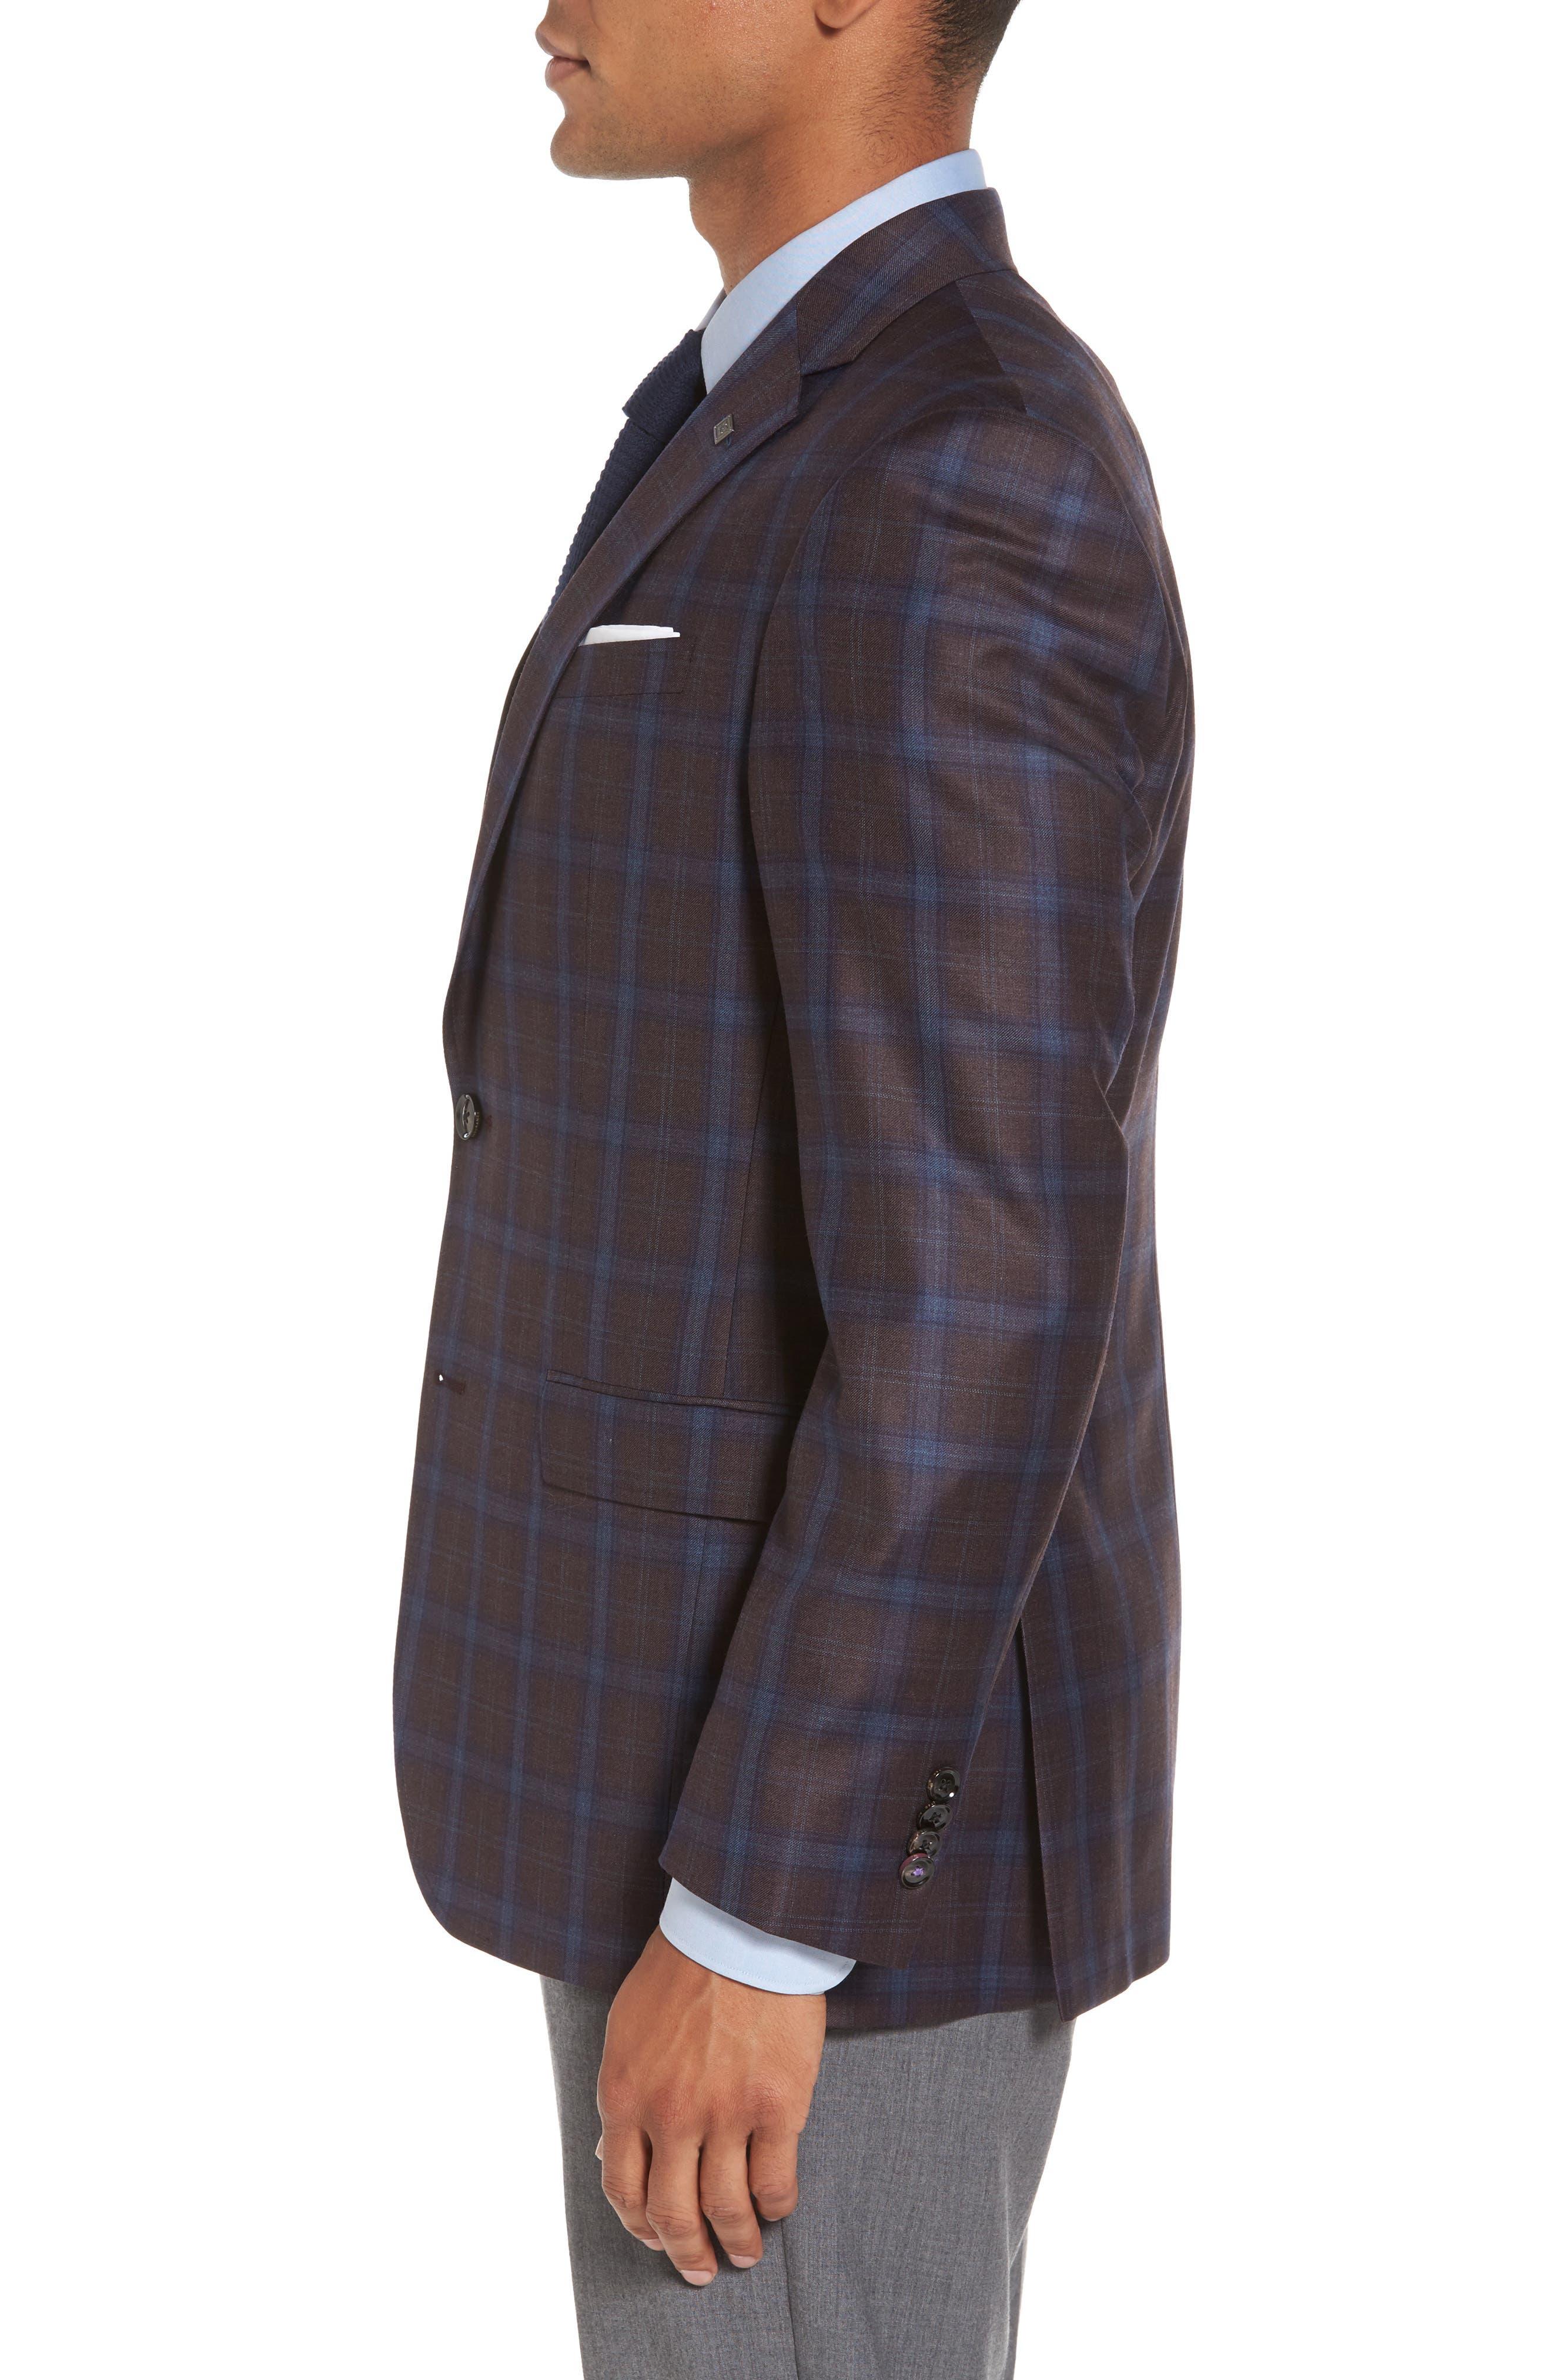 Jay Trim Fit Plaid Wool Sport Coat,                             Alternate thumbnail 3, color,                             932